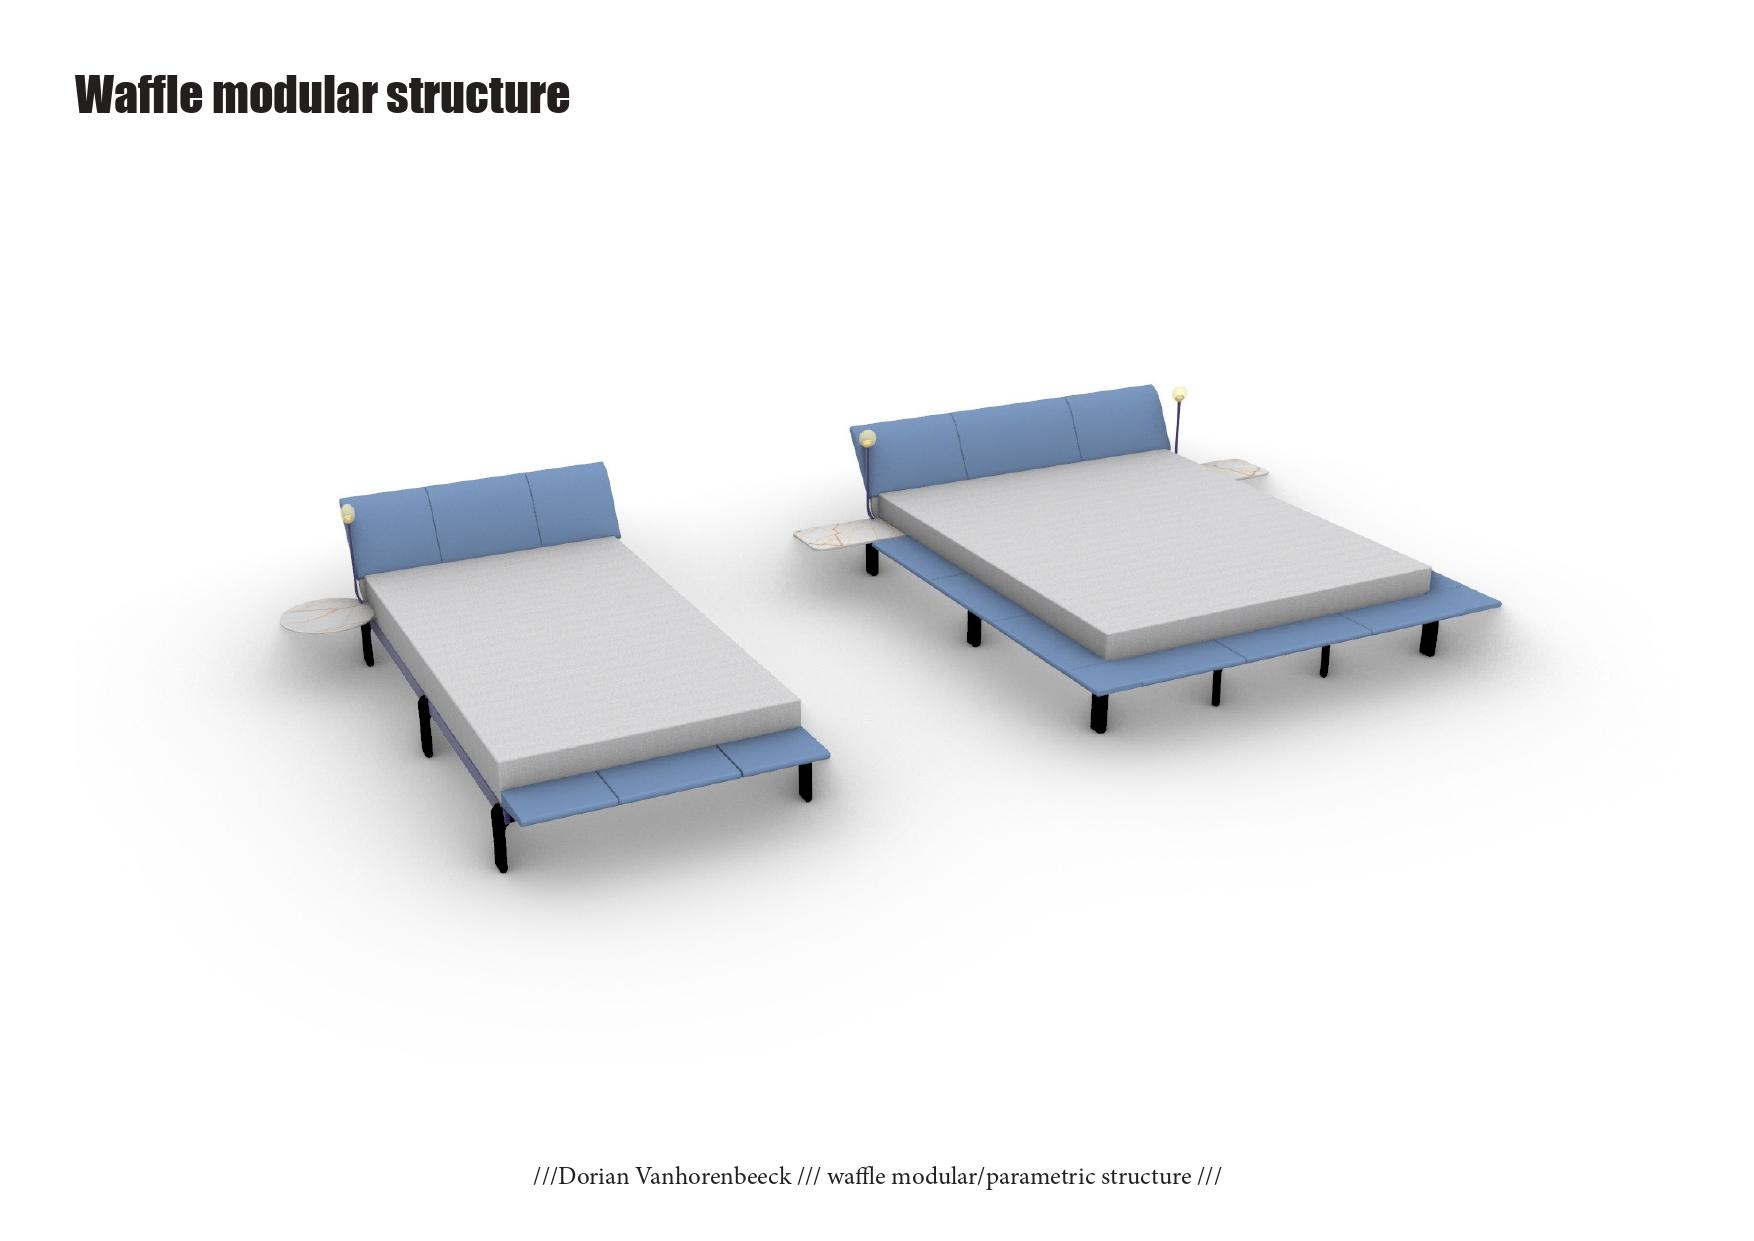 Livret Waffle modular-parametric Structure Dorian Vanhorenbeeck_page-0001